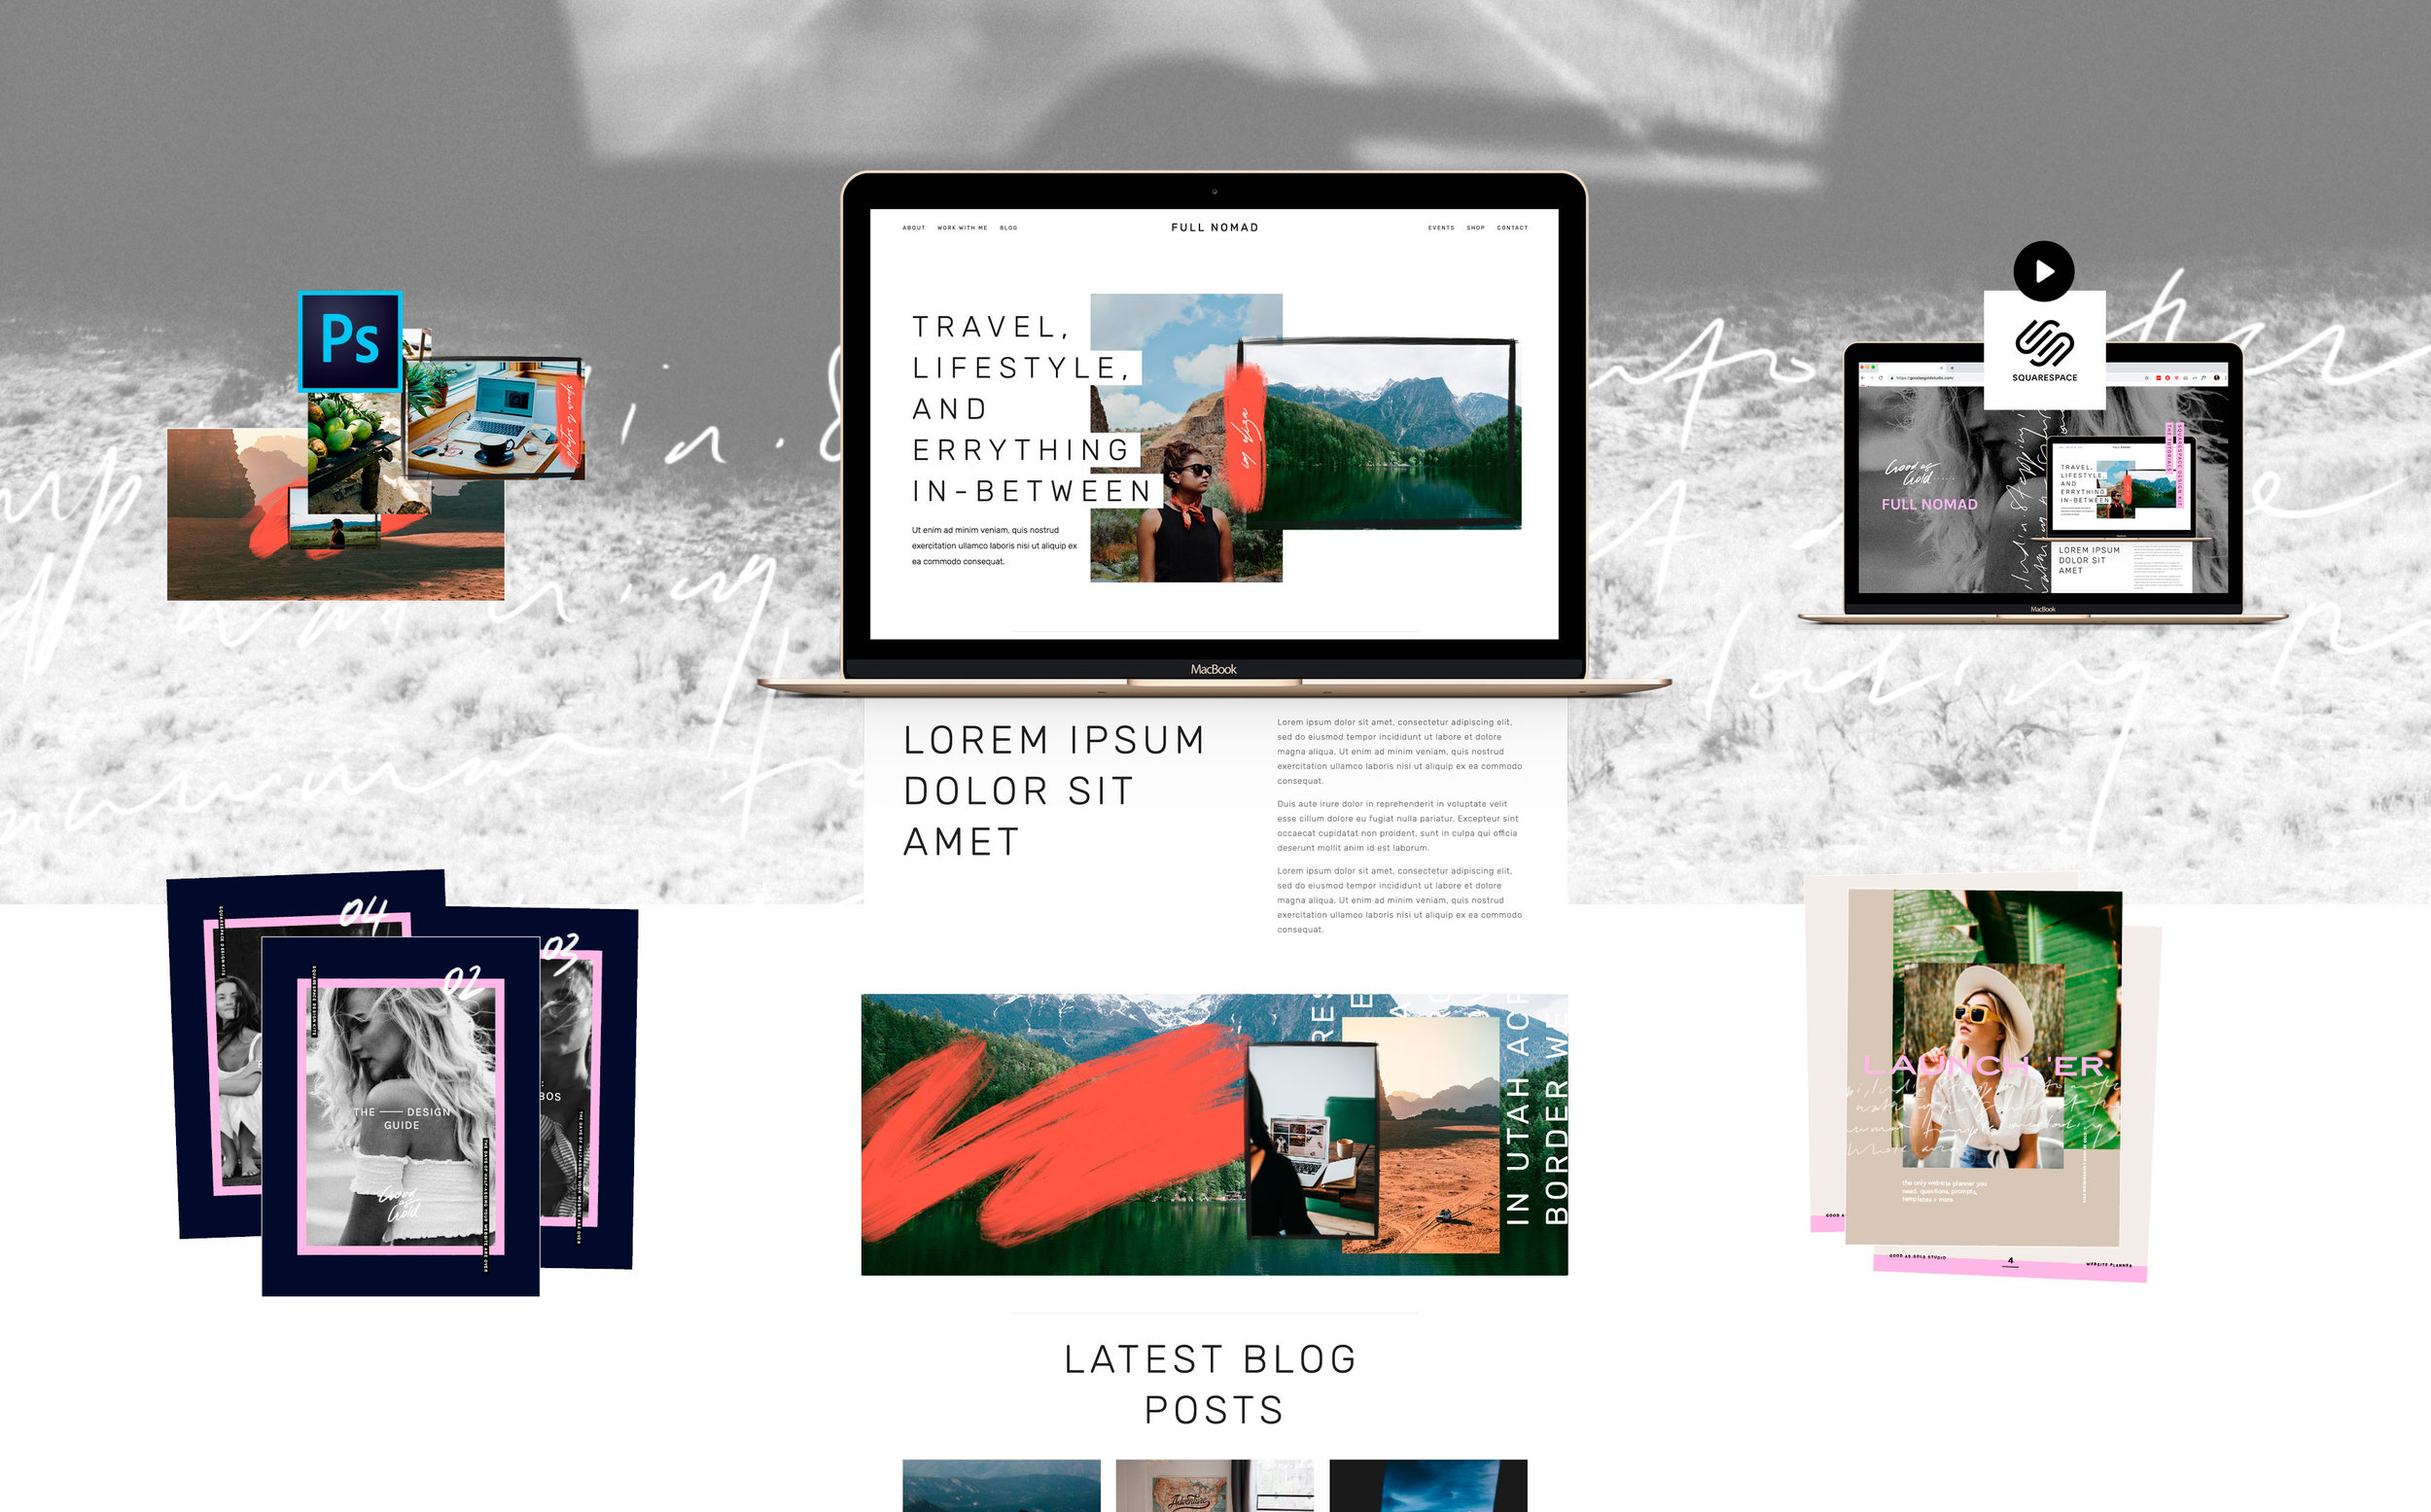 Squarespace Design Kit |Good As Gold Studio | Squarespace Design Kit Templates & DIY Branding